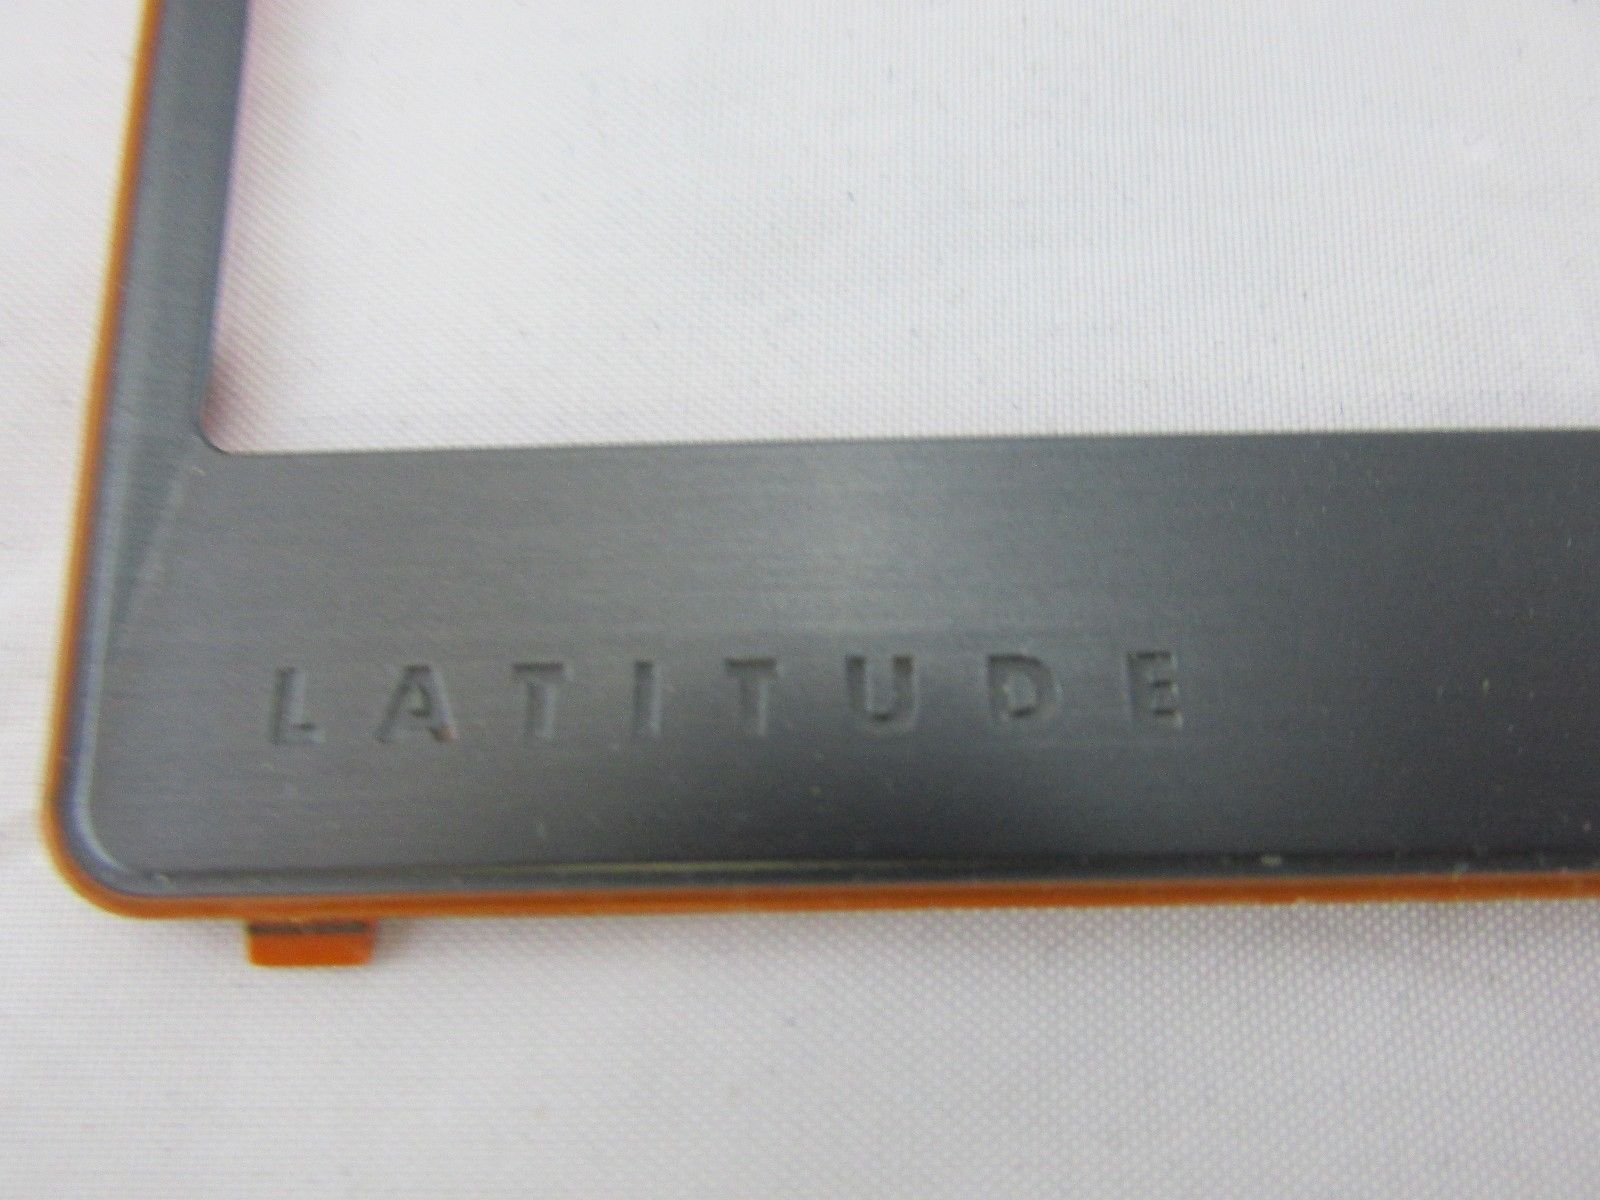 Dell Latitude E6320 / E6420 Keyboard Bezel Trim Surround P/N 2KJ1G